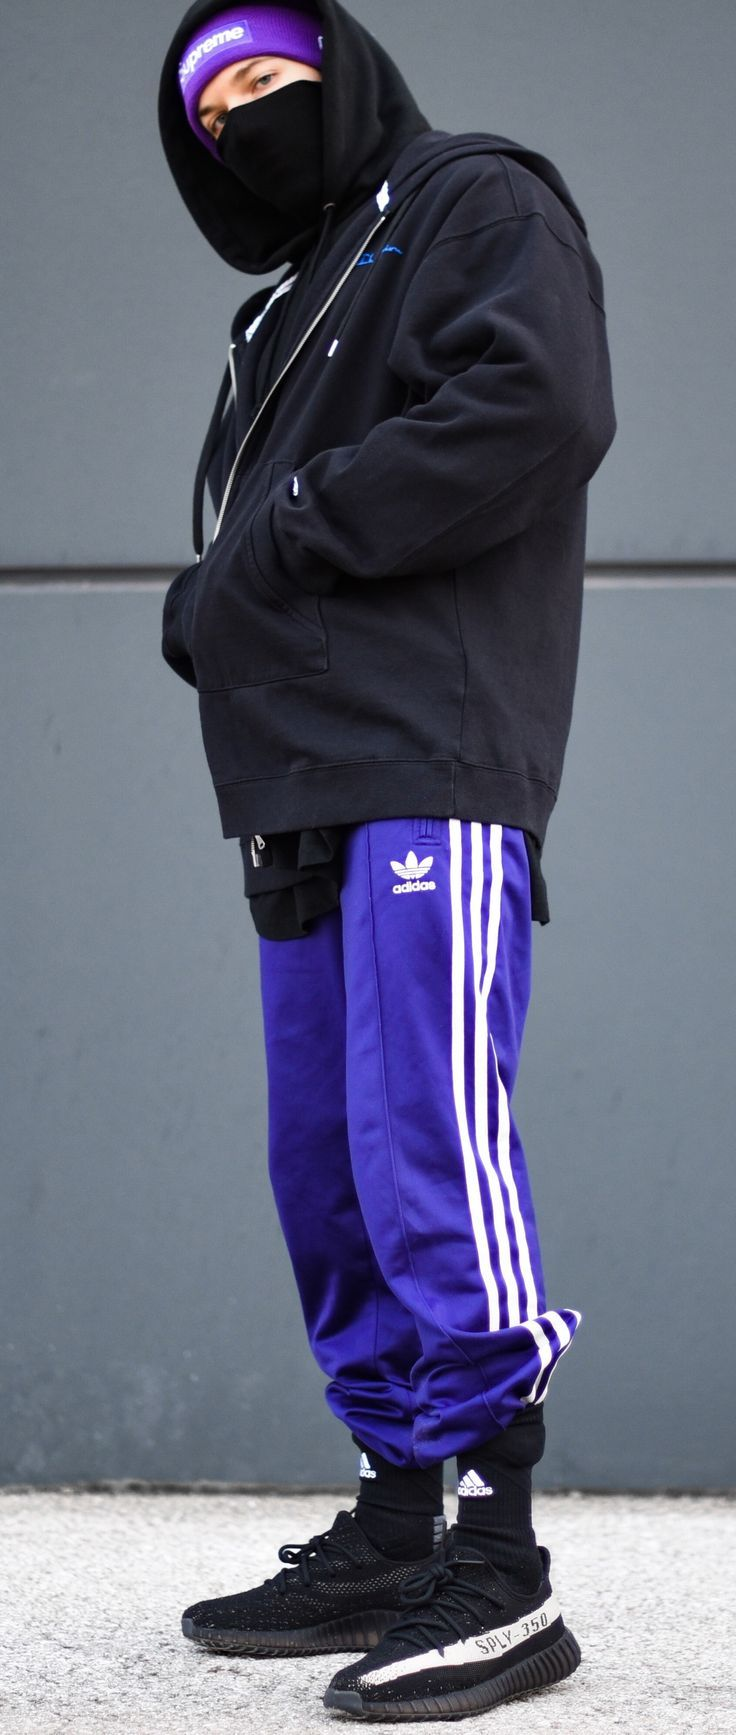 Adidas - sears.com